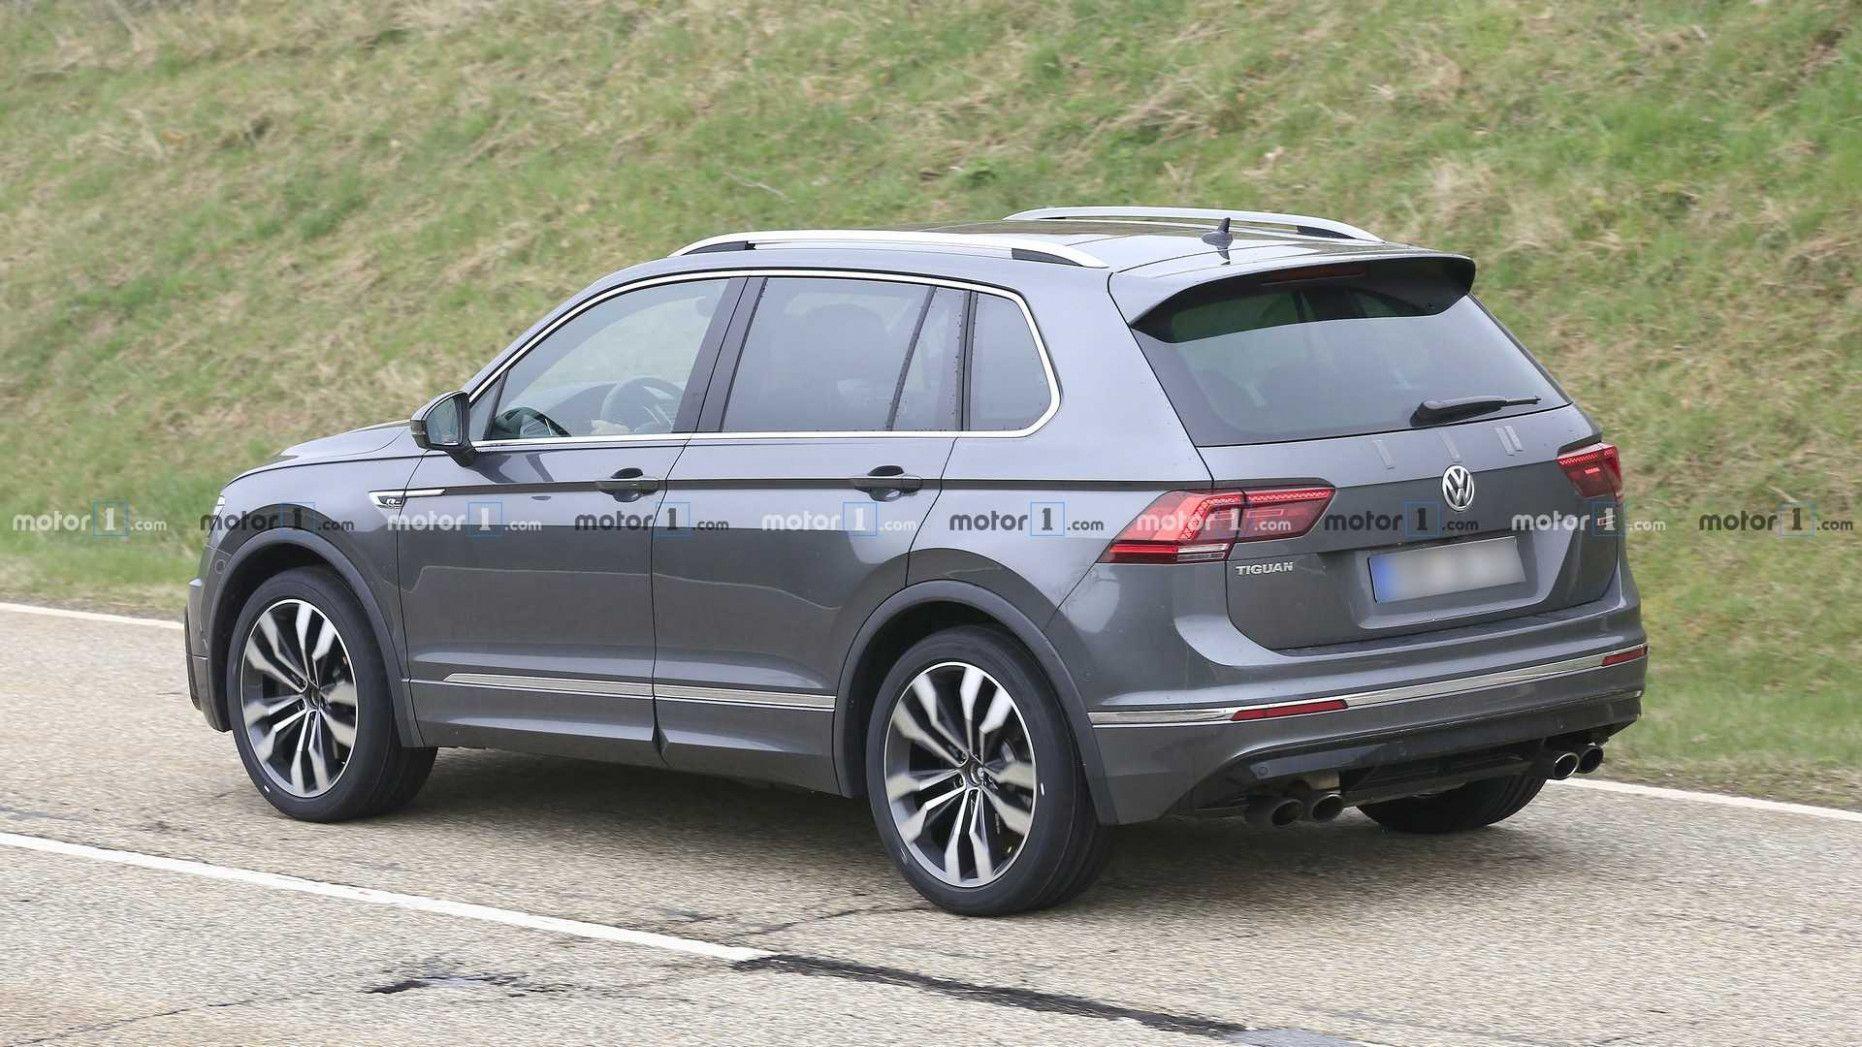 Vw Tiguan Facelift And Tiguan R Concept Due In 3 Volkswagen Tiguan Wolfsburg Edition 2020 In 2020 Tiguan R Volkswagen Volkswagen Passat